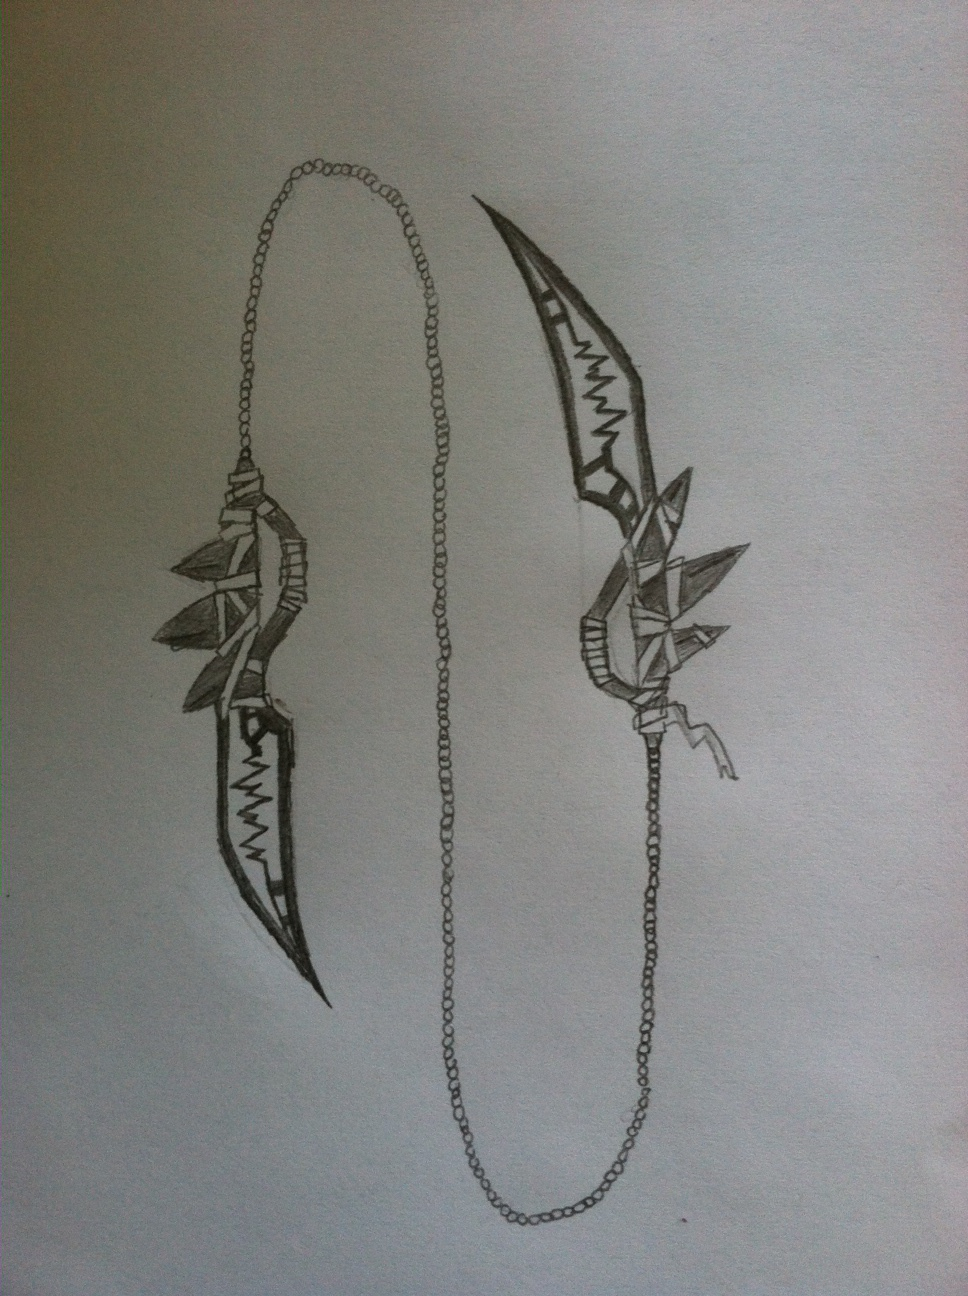 Drawn scythe darkness Dark Chain Scythe Chain Scythe